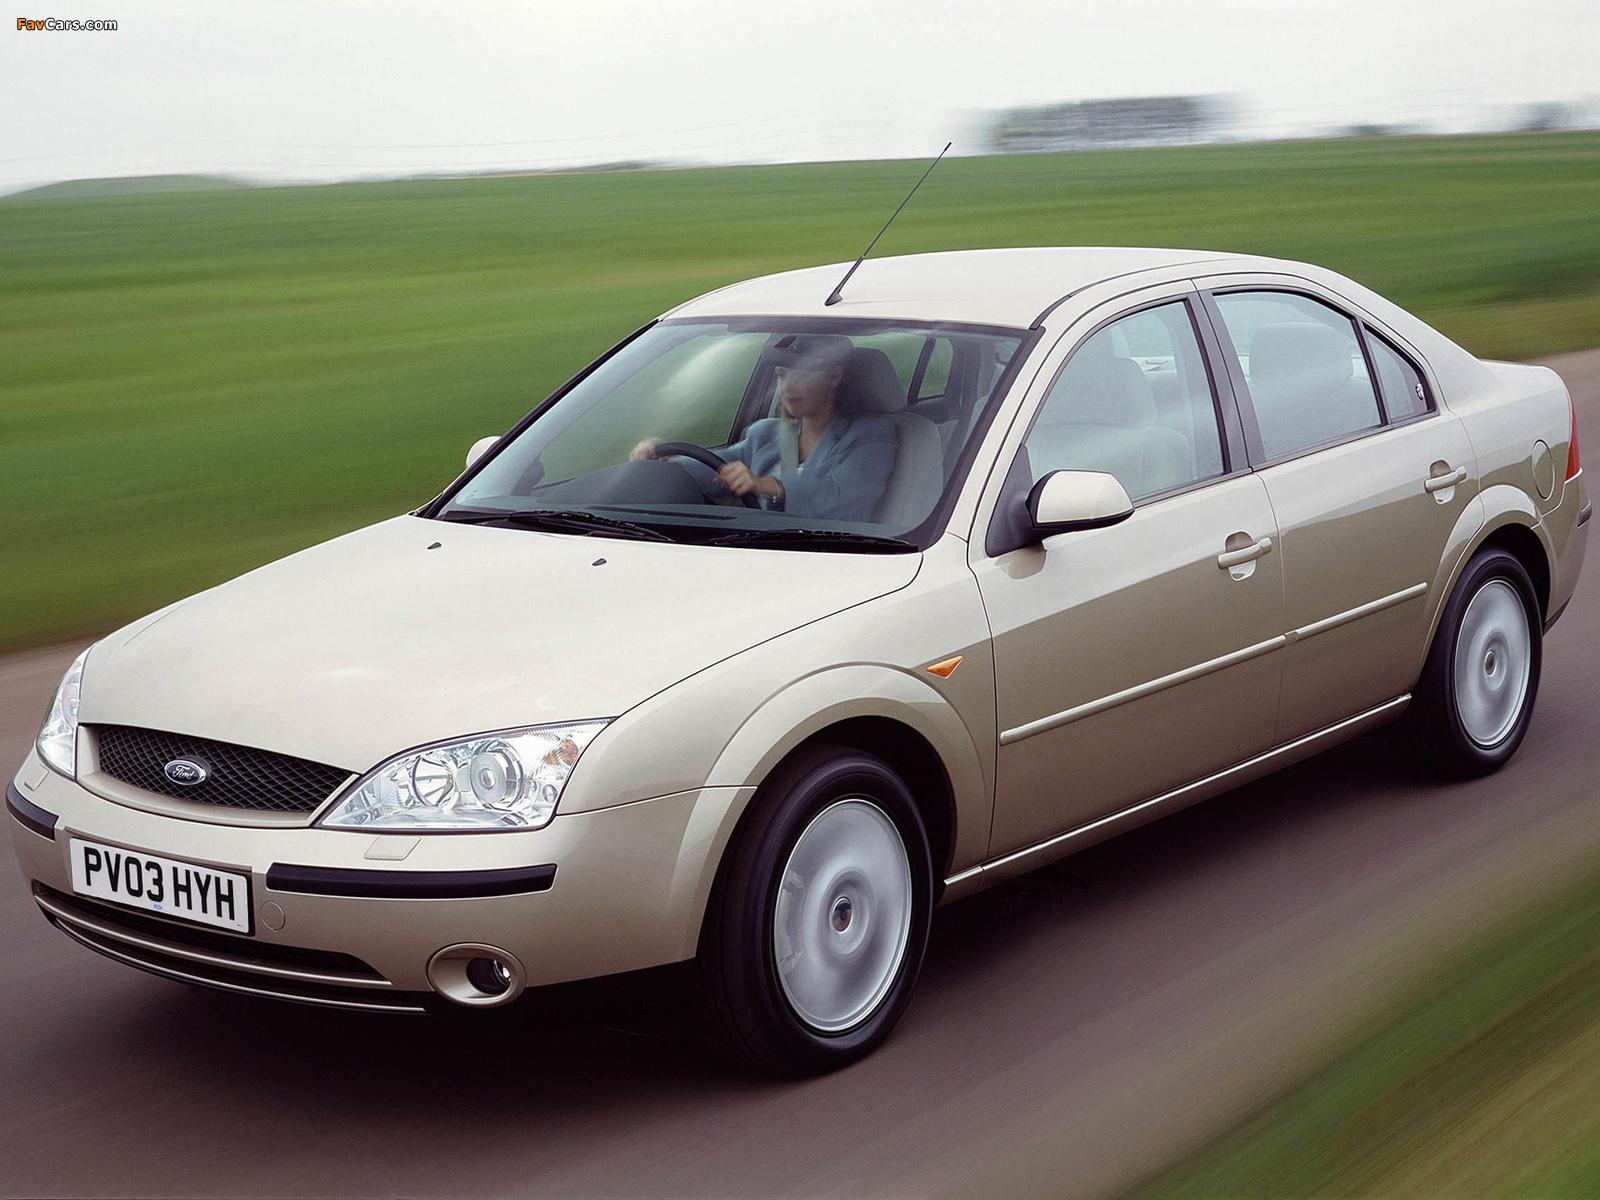 Ford Mondeo (Форд Мондео) - Продажа, Цены, Отзывы...